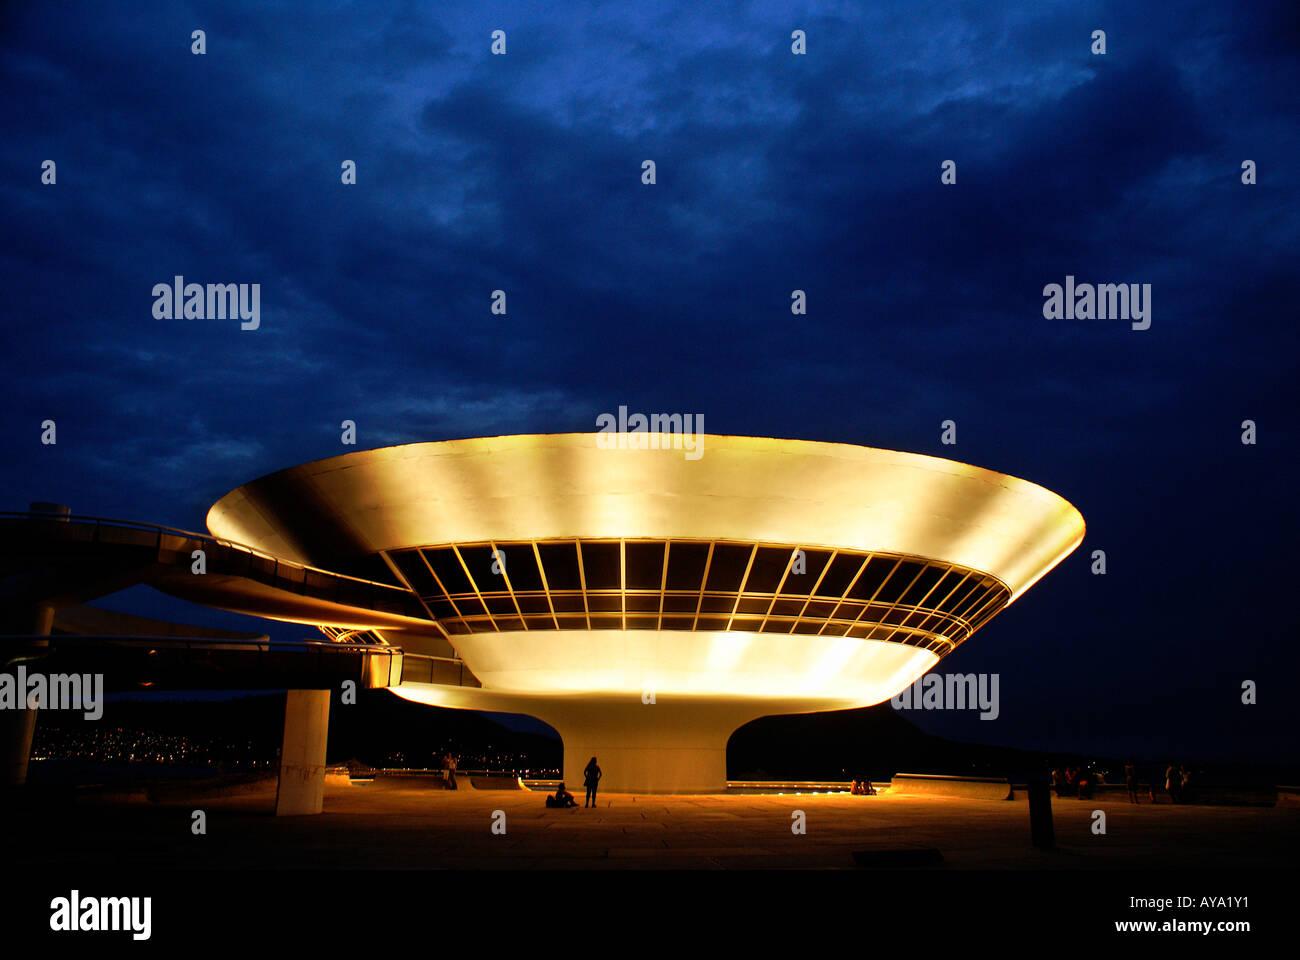 Museo di Arte Contemporanea (Museu de Arte Contemporanea, MAC) dall'architetto Oscar Niemeyer, Niteroi, Brasile Immagini Stock